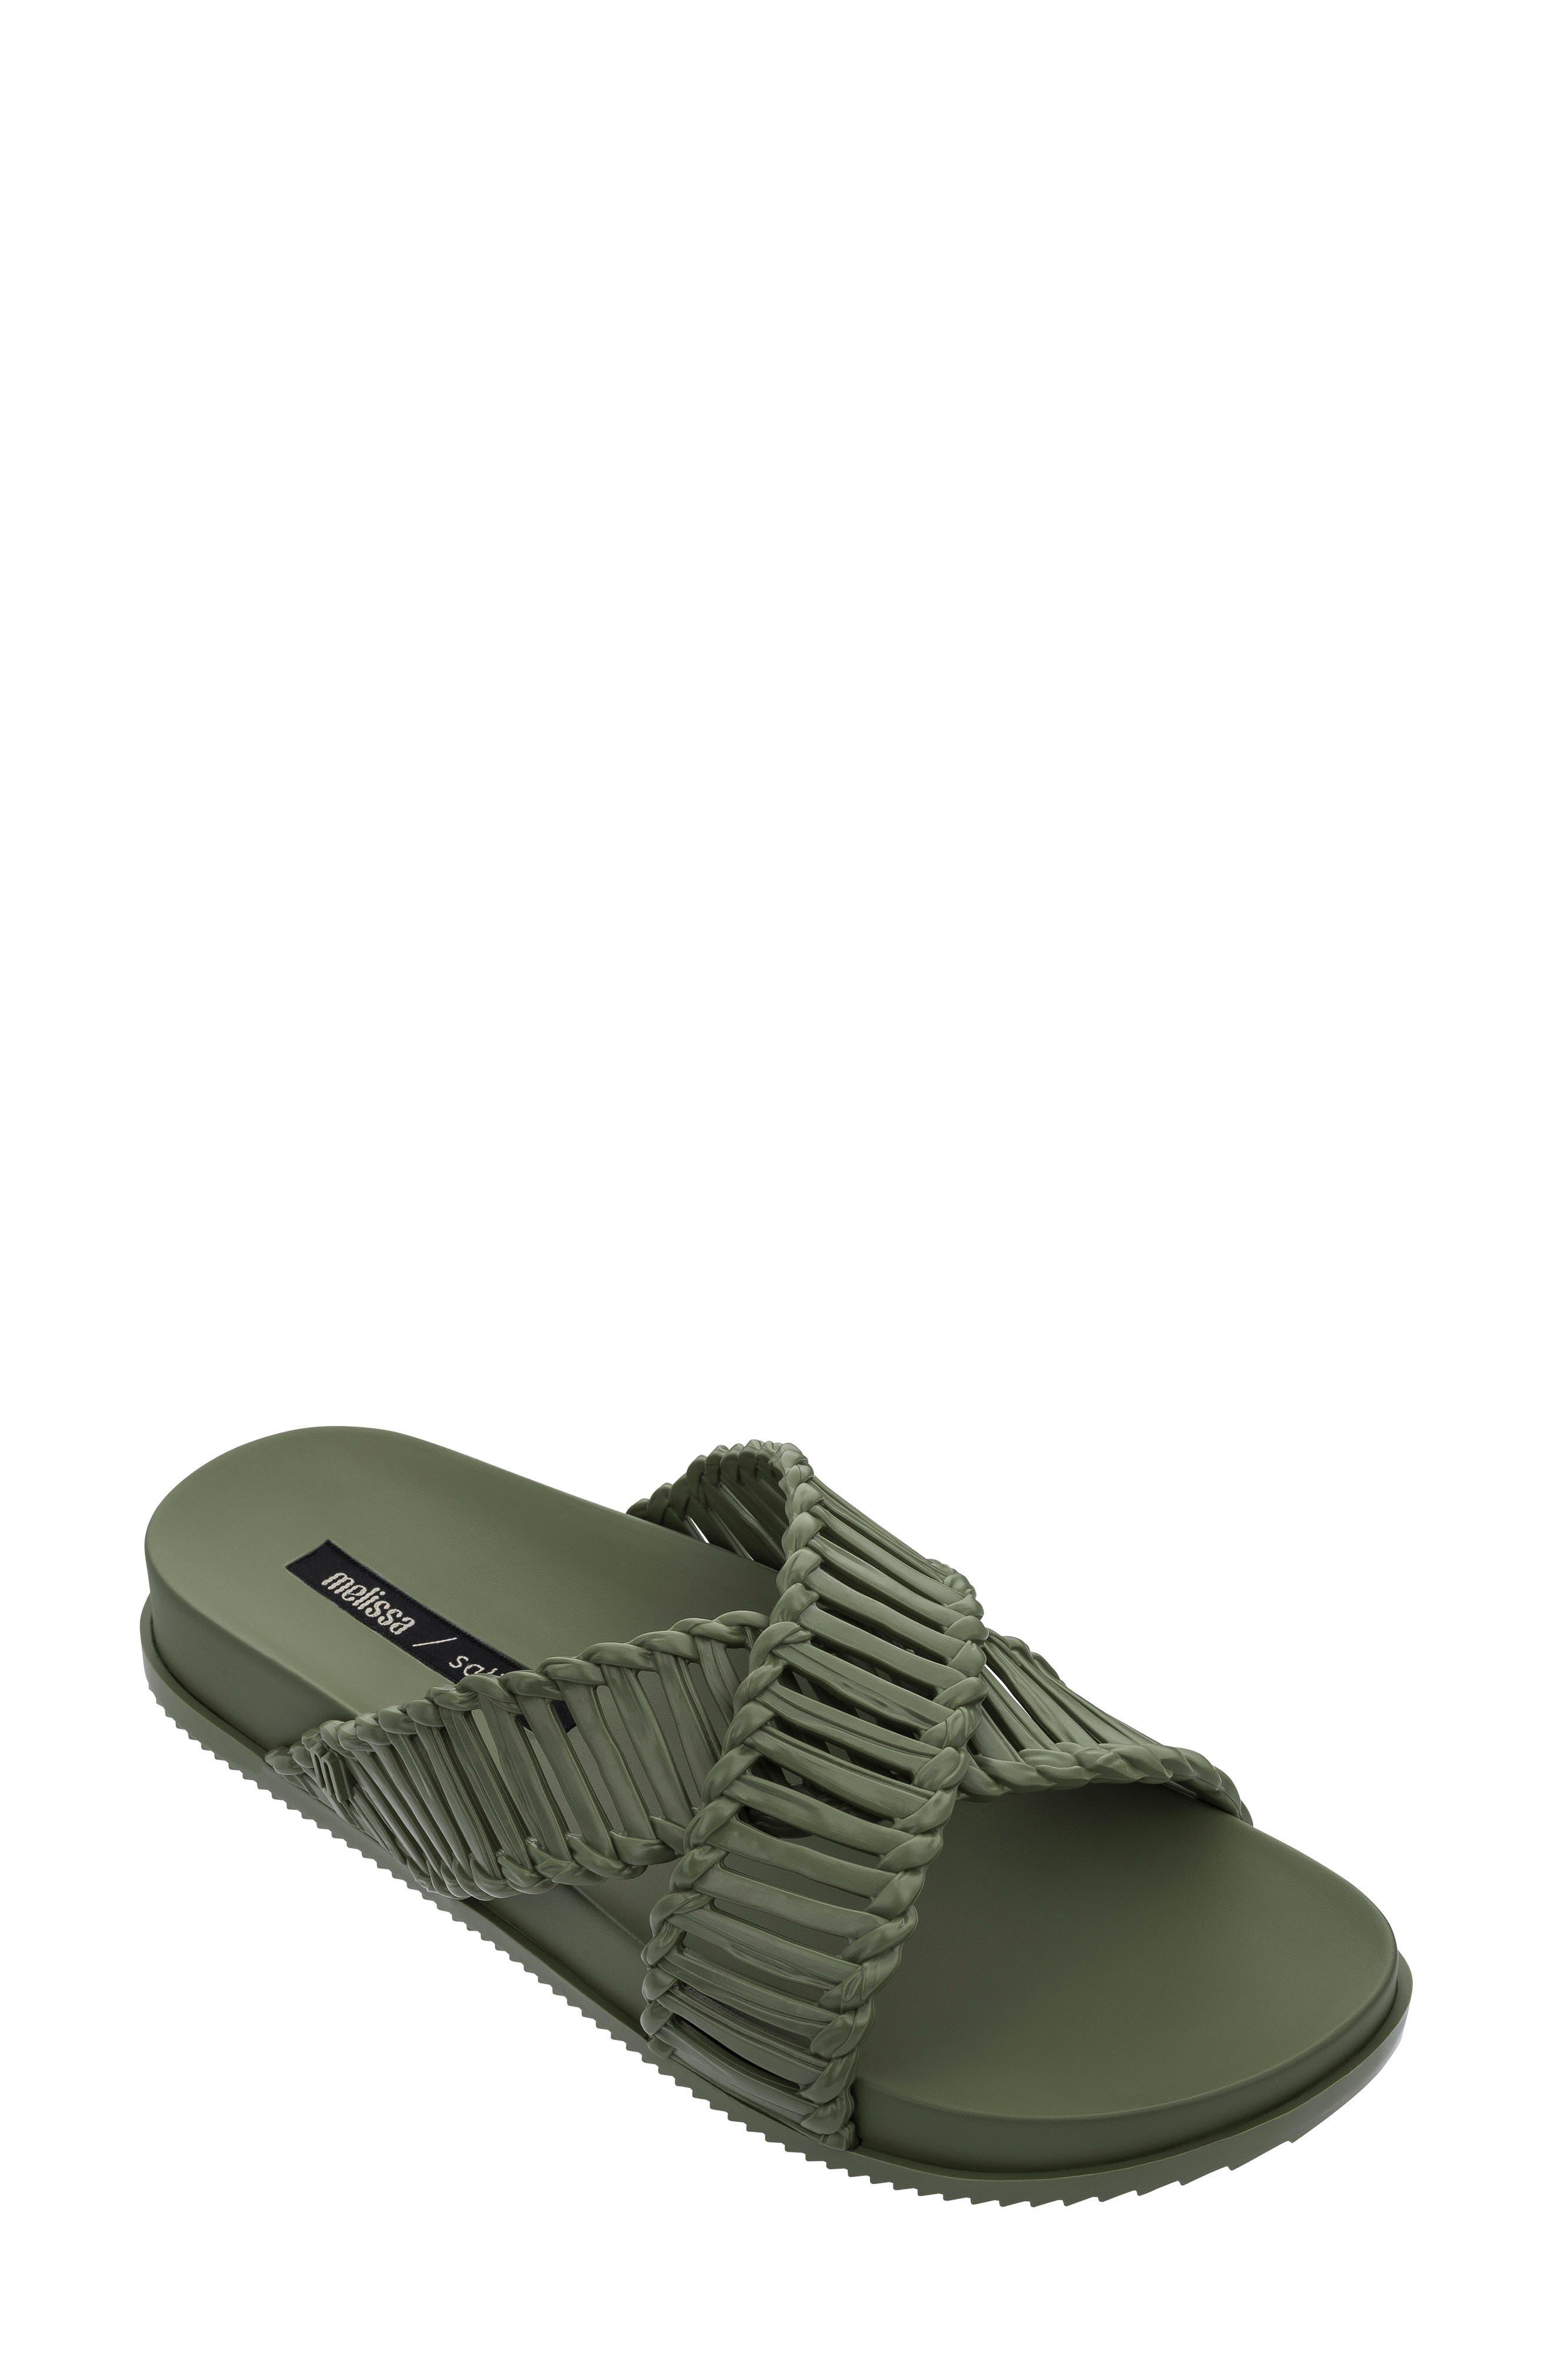 Women's Melissa Shoes | Nordstrom